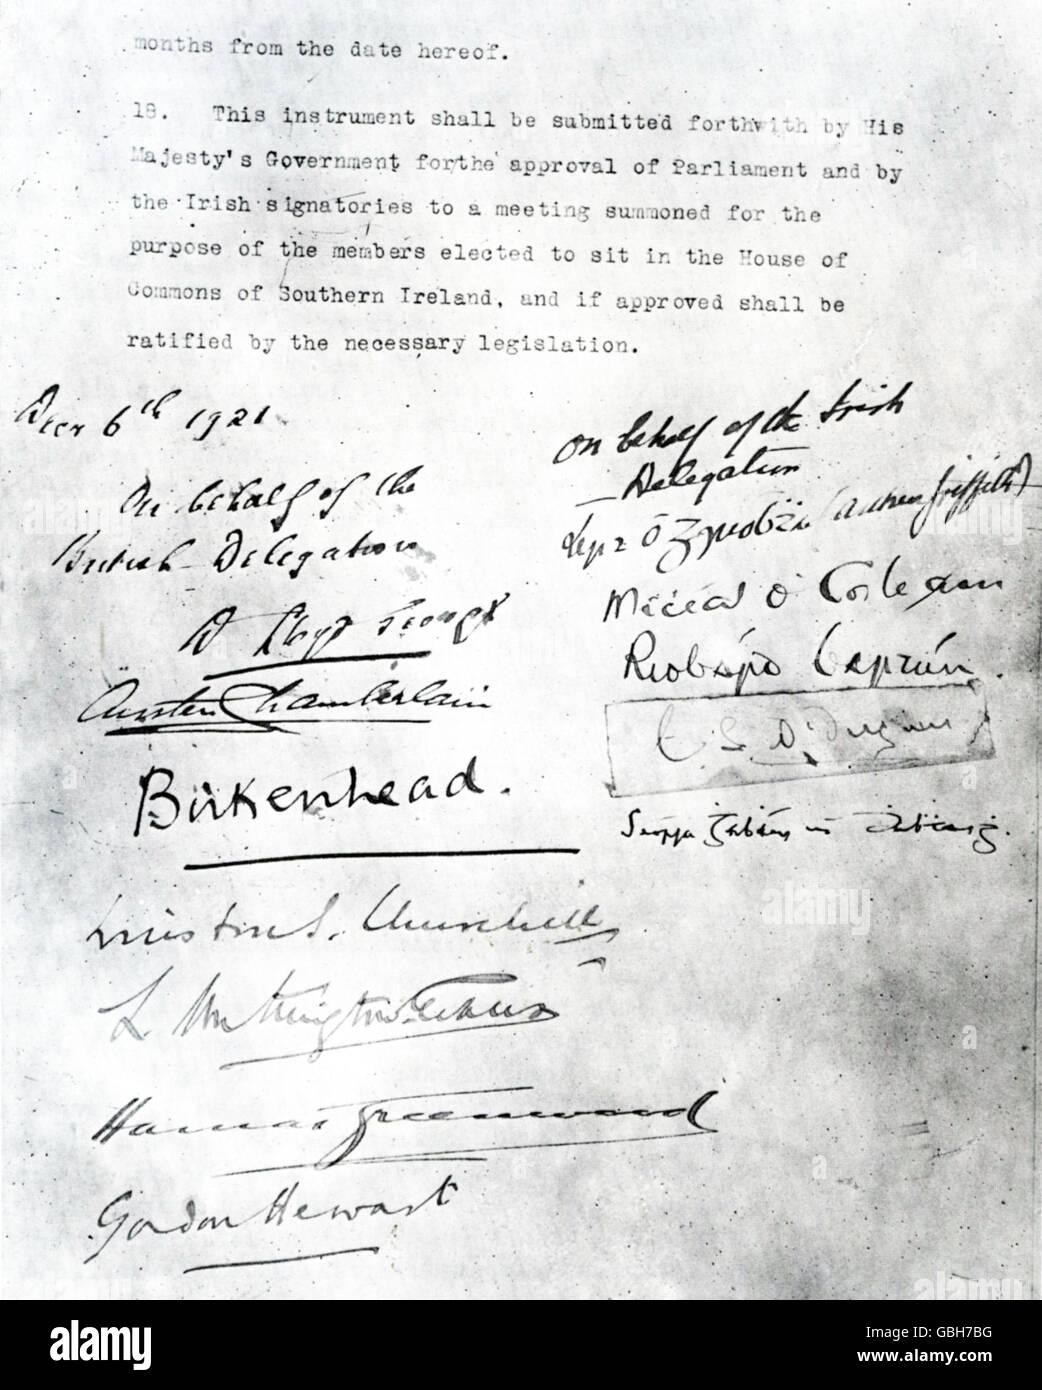 ANGLO-IRISH TREATY December 1921 - signature page - Stock Image